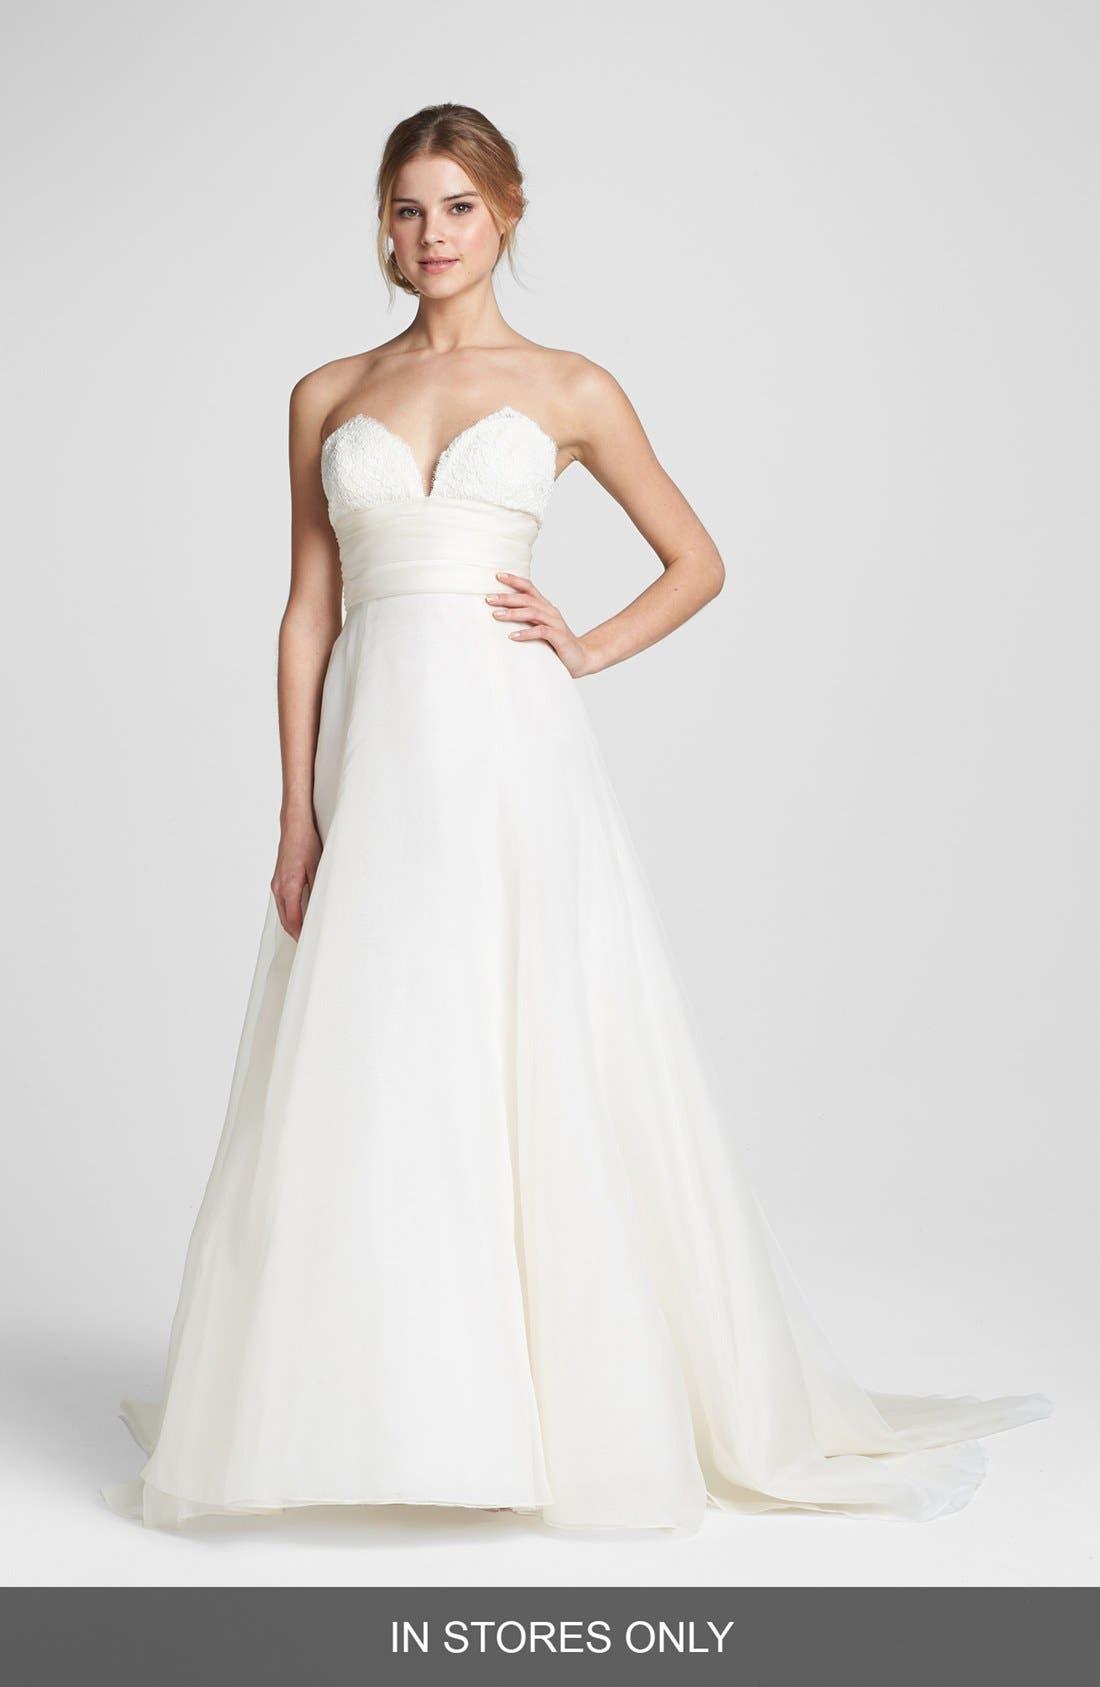 Wedding Dresses & Bridal Gowns | Nordstrom